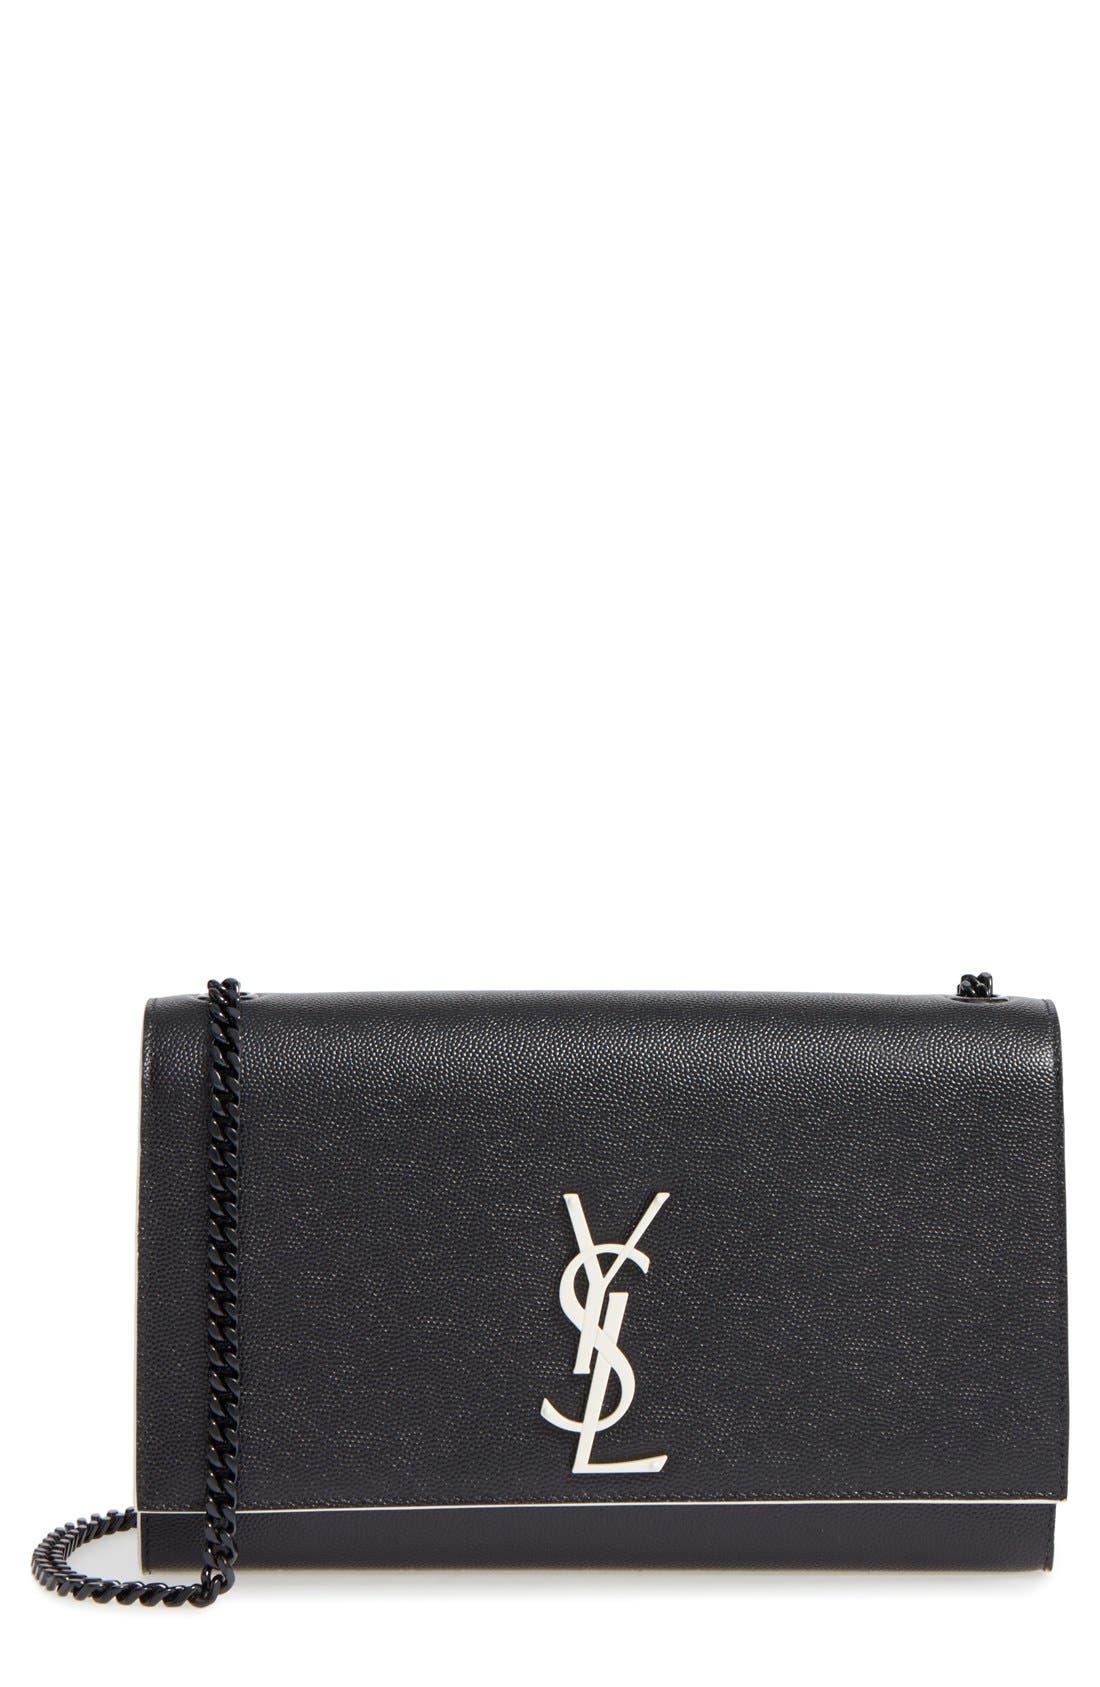 Alternate Image 1 Selected - Saint Laurent Medium Kate Grainy Leather Shoulder Bag